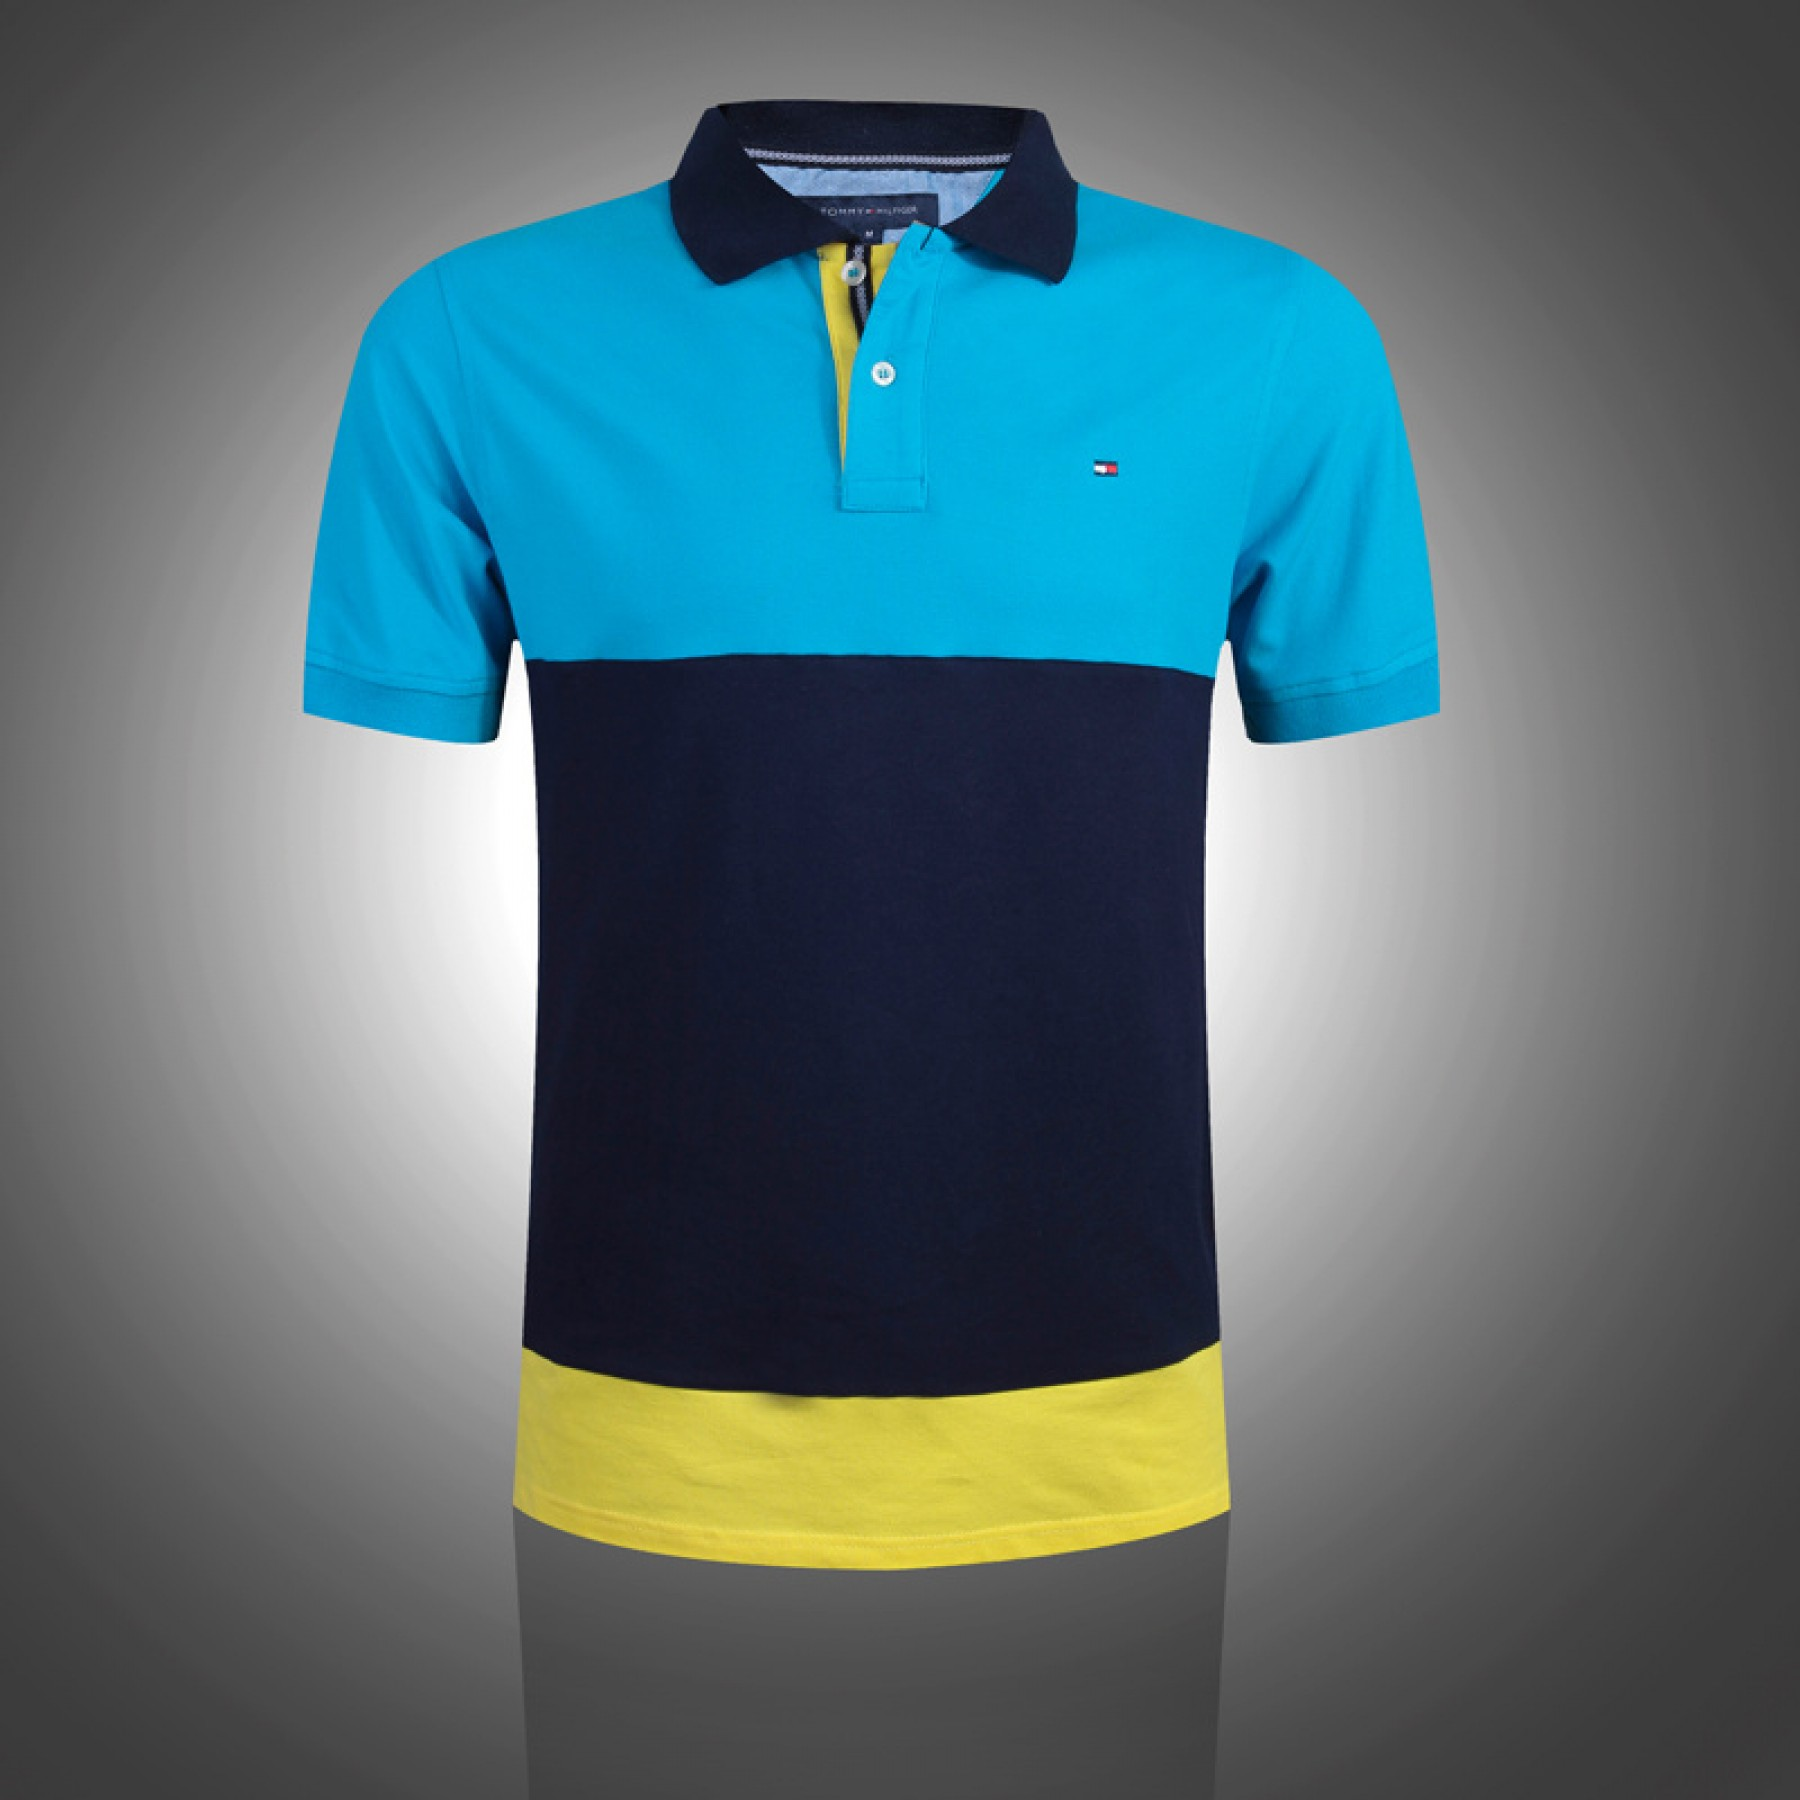 683b3ce4a66c0 Camisa Polo Masculina Tommy Hilfiger Cod 0362